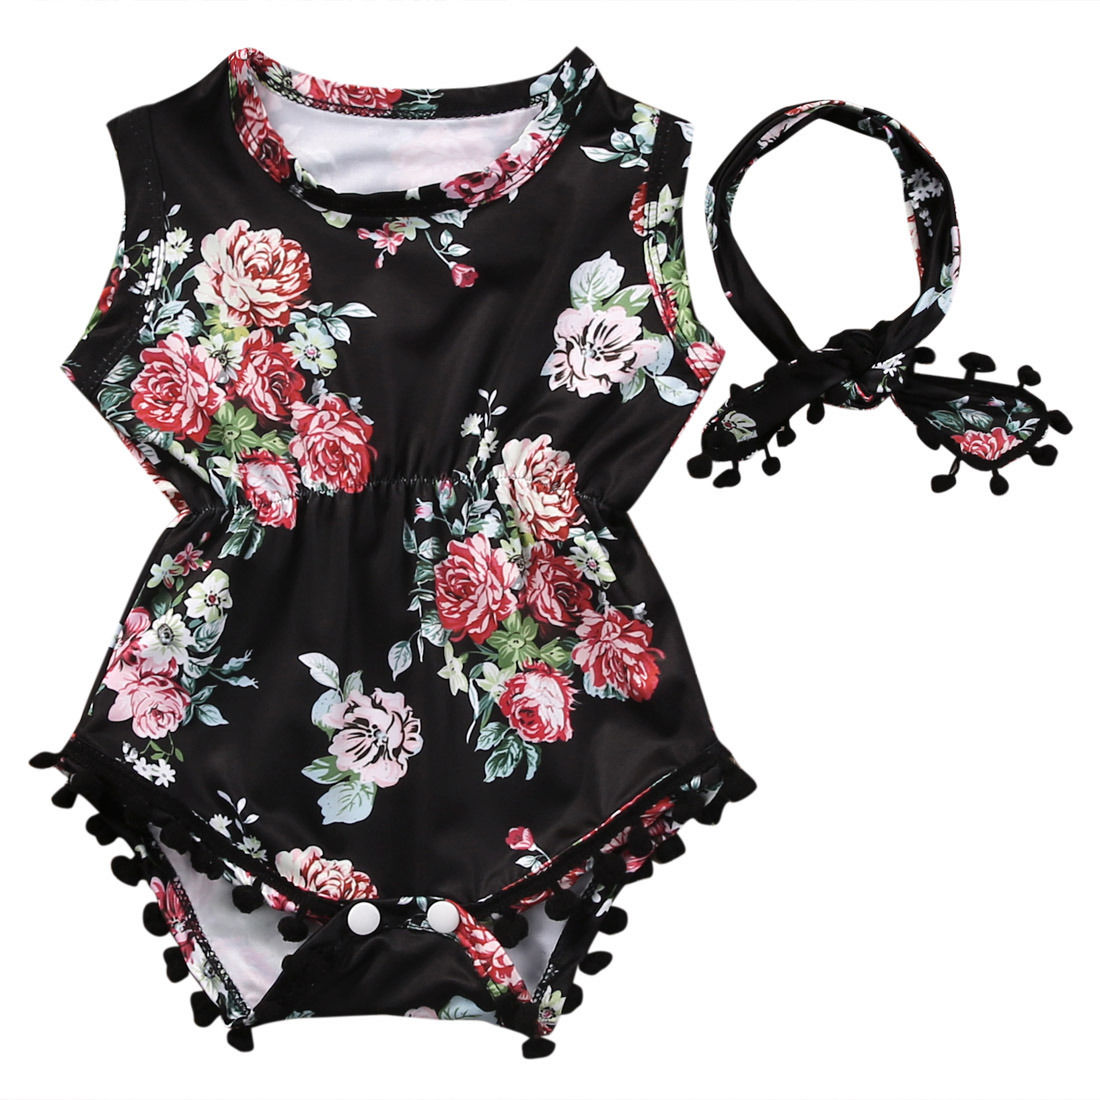 Cotton Baby Girls Floral Romper One-pieces Sunsuit Headband Clothes Set